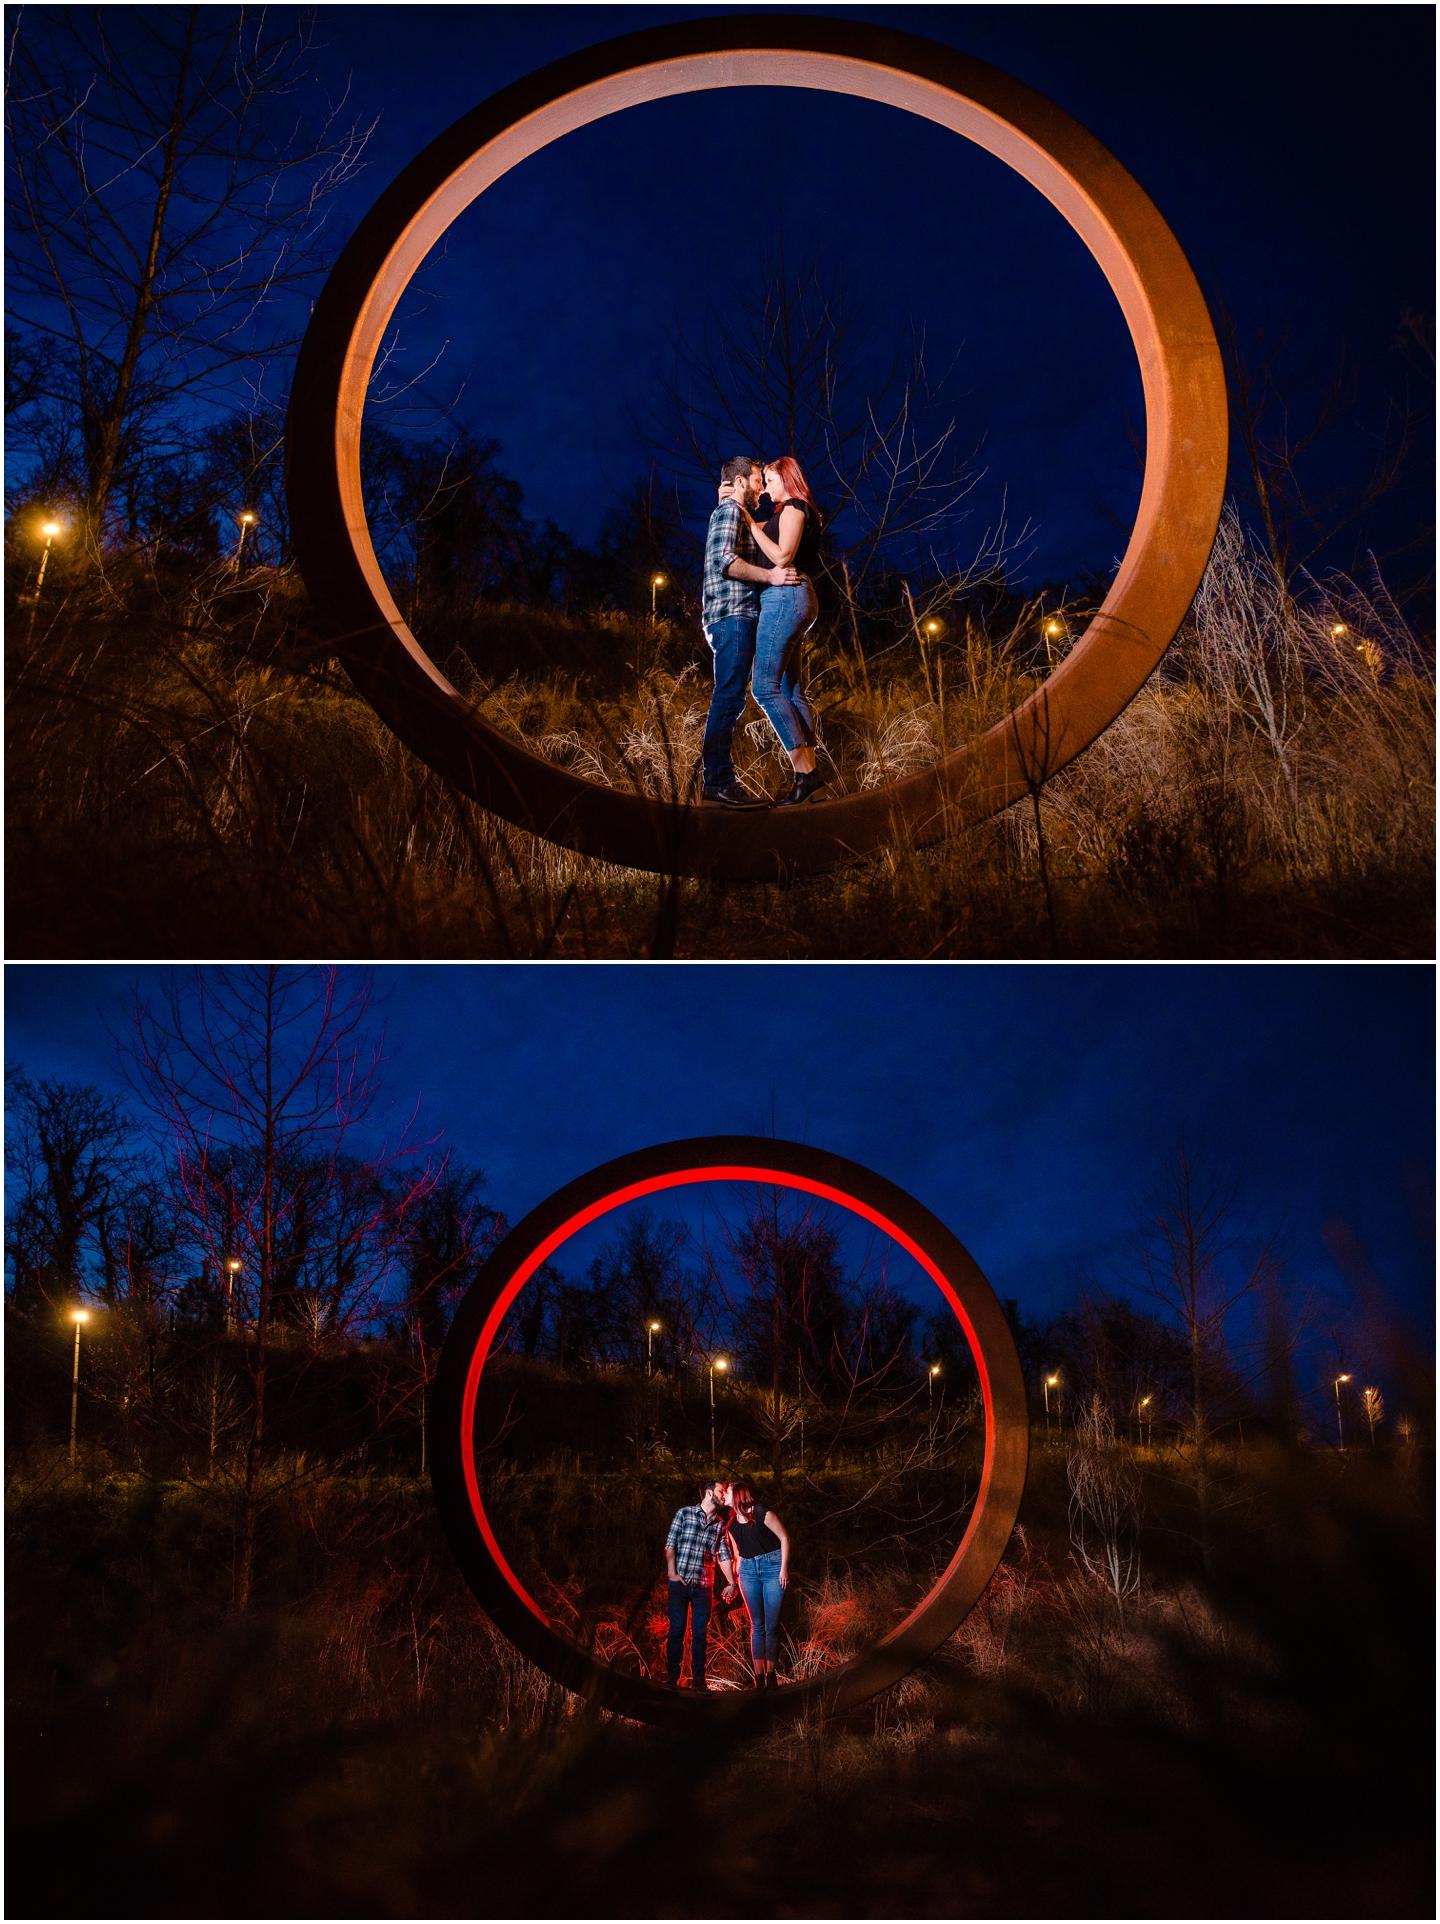 Floodwall park Richmond VA night time engagement photography by Marek K. Photography